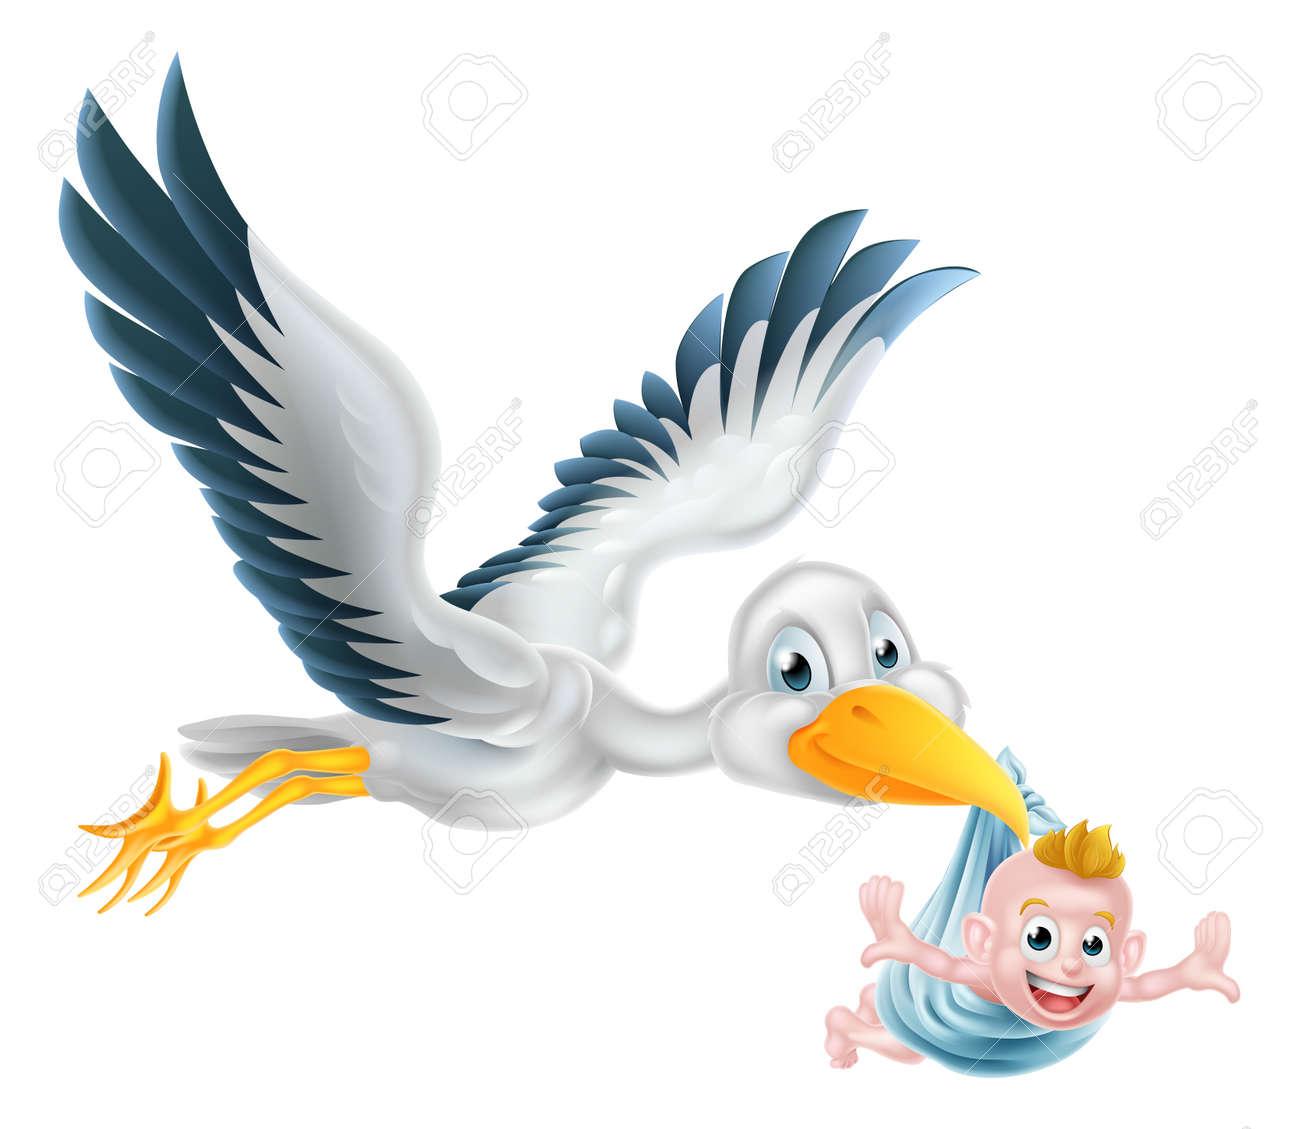 A happy cartoon stork bird animal character flying through the air holding a newborn baby. Classic myth of stork bird delivering a new born baby - 53120955